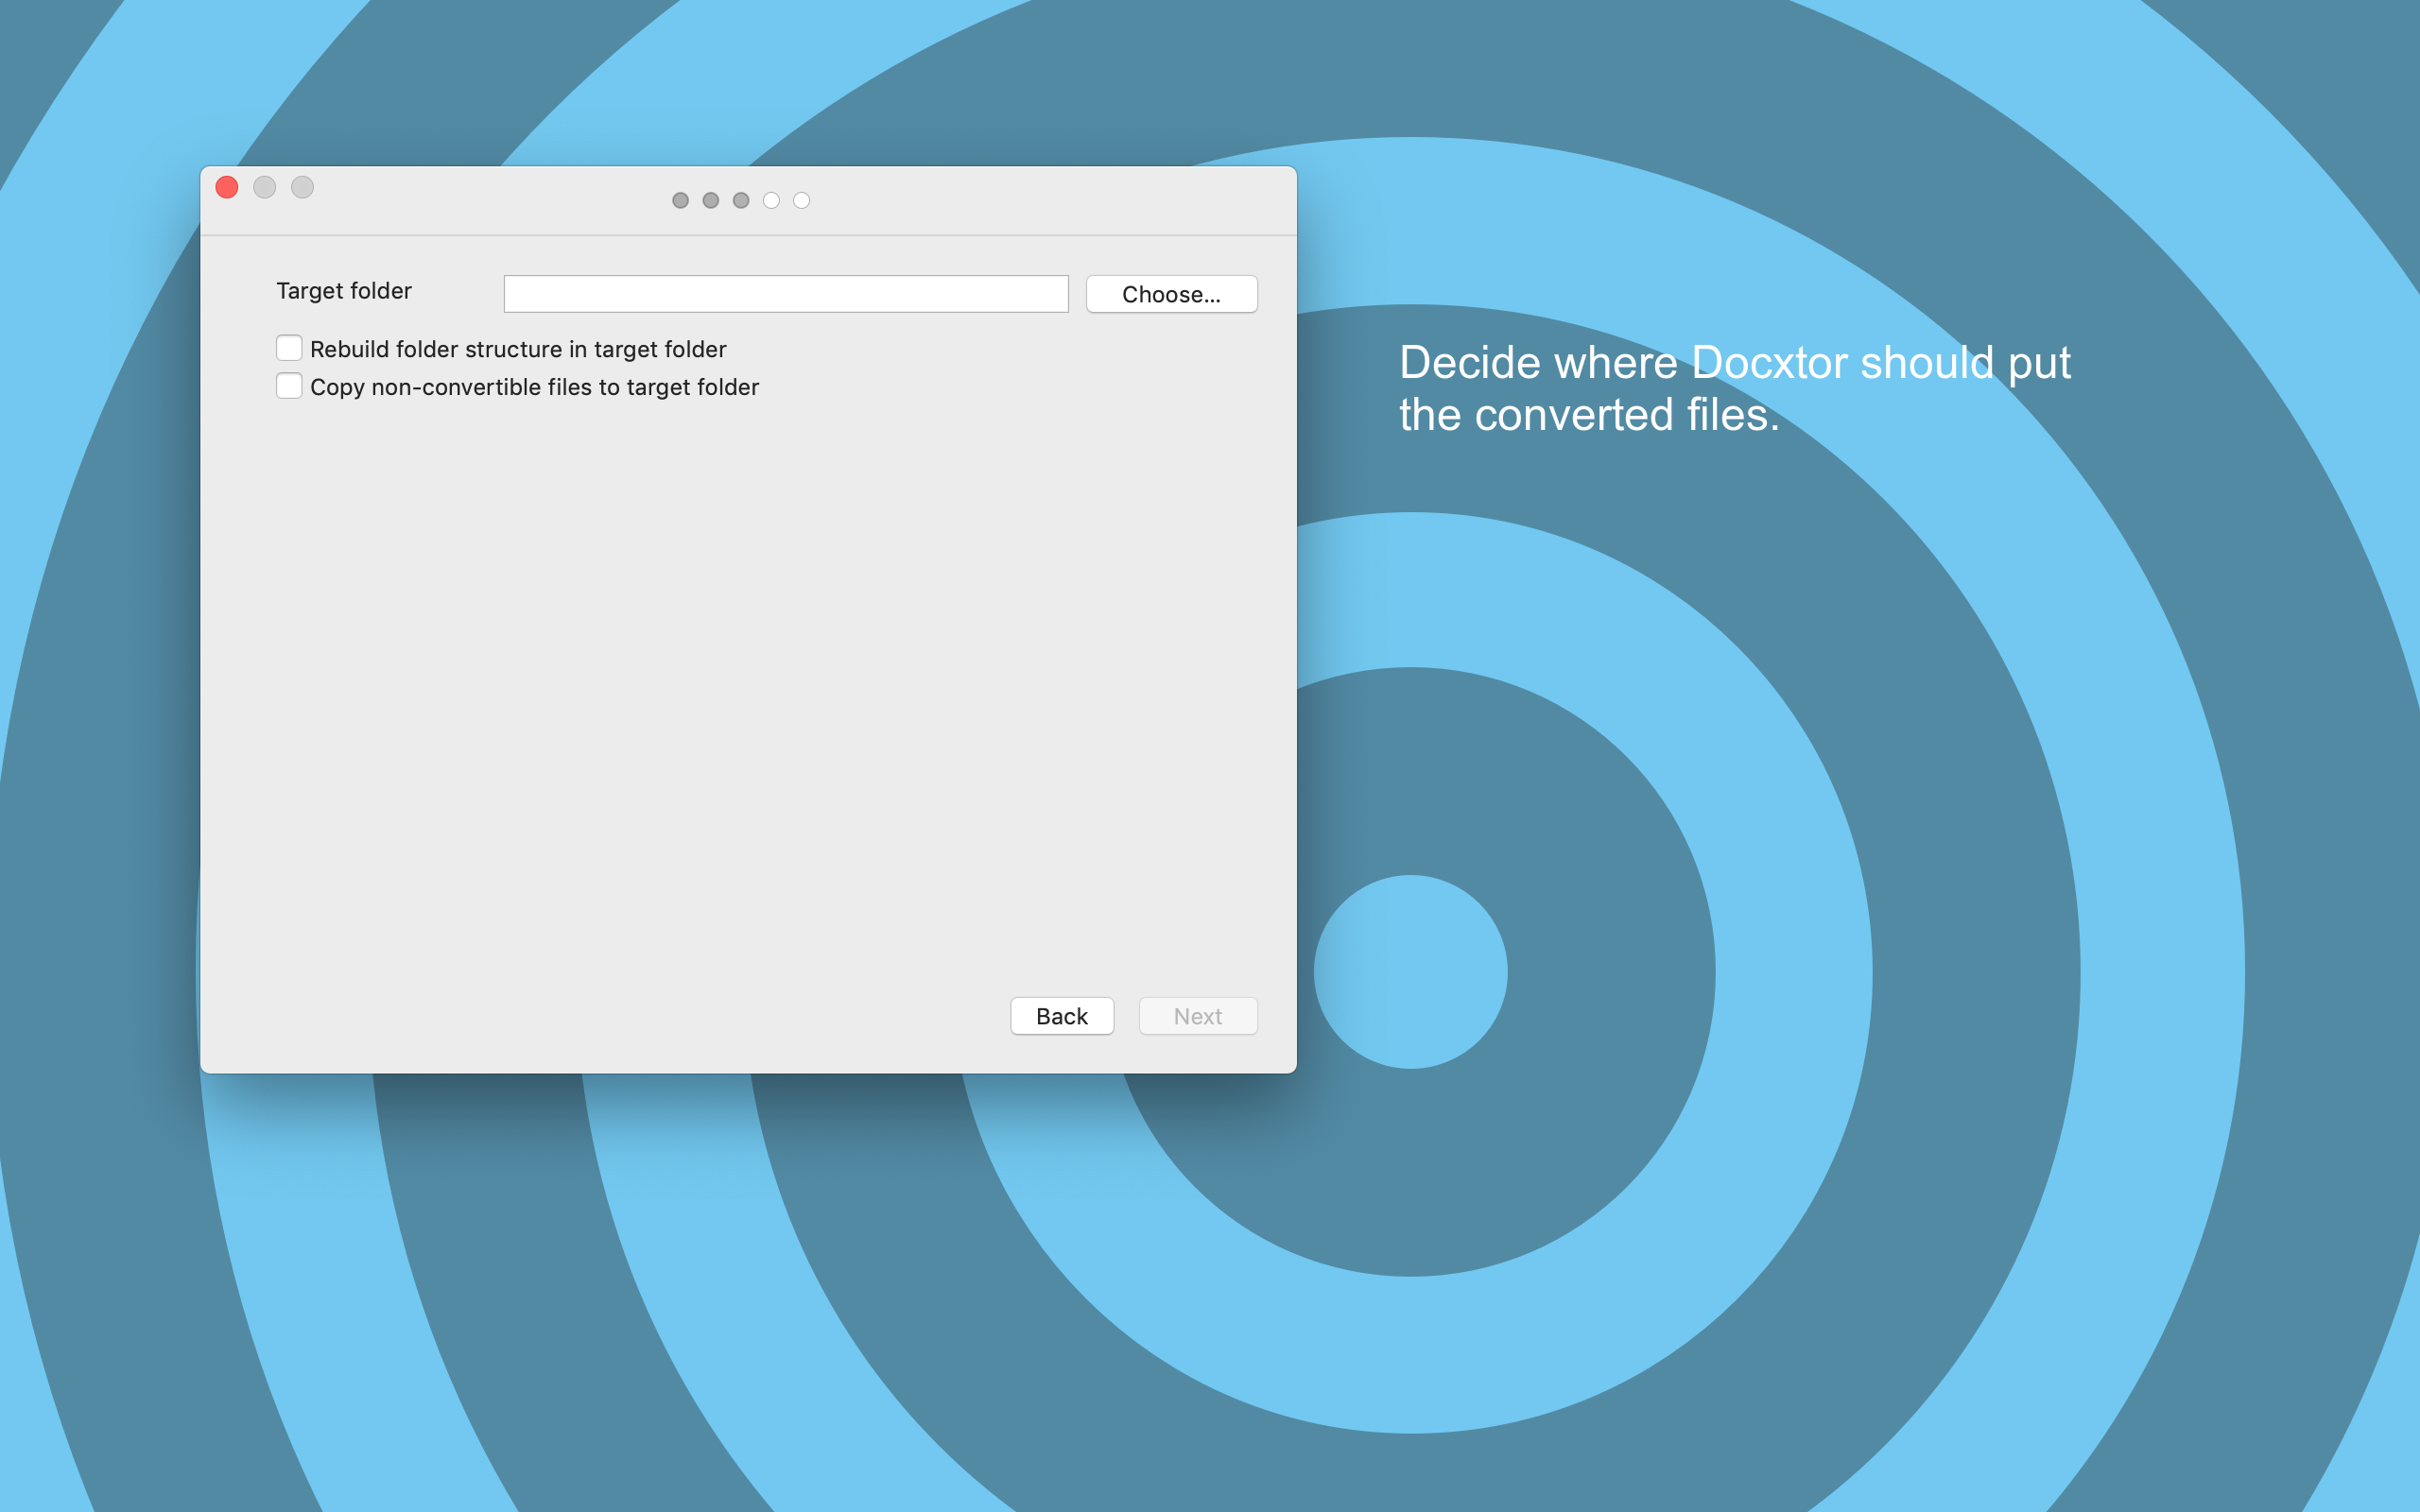 Docxtor 1.12文件格式转换工具